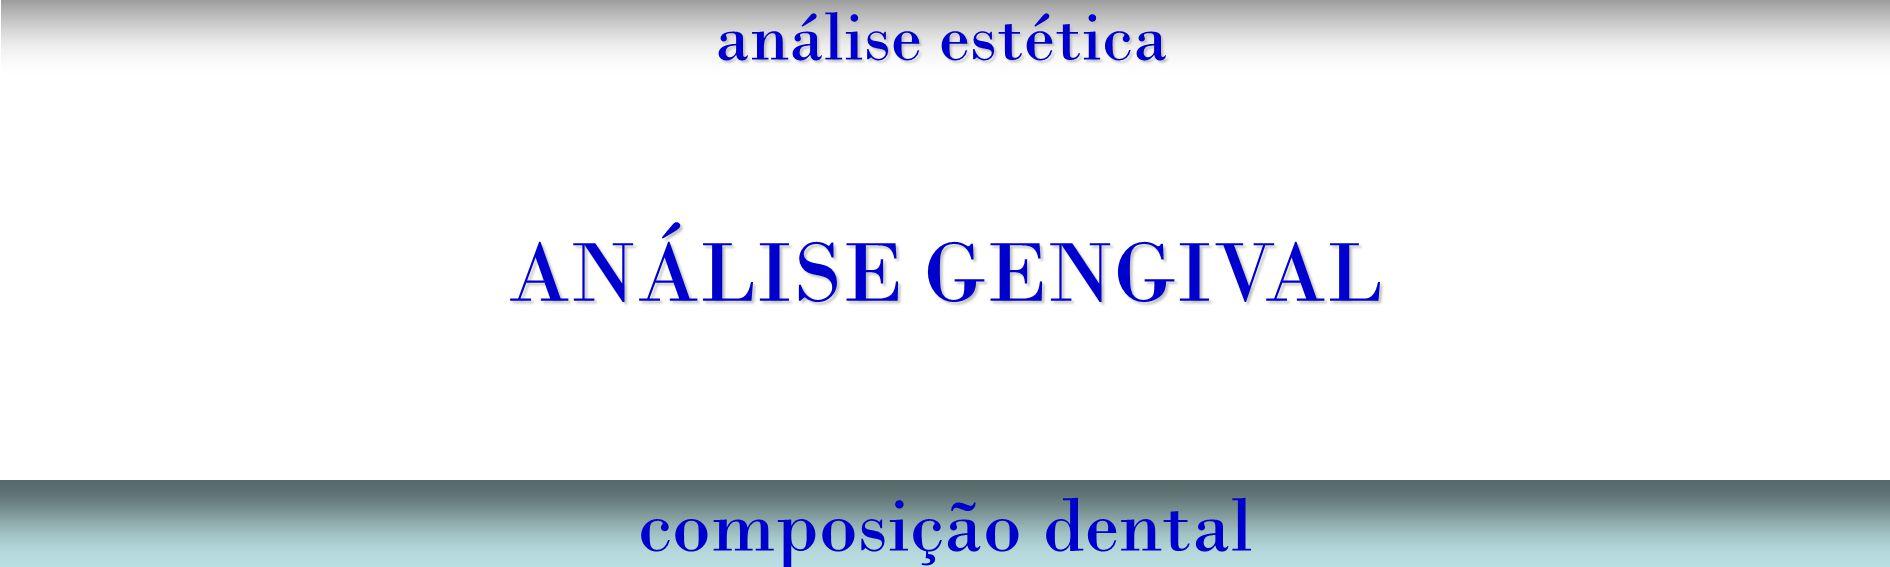 análise estética composição dental ANÁLISE GENGIVAL